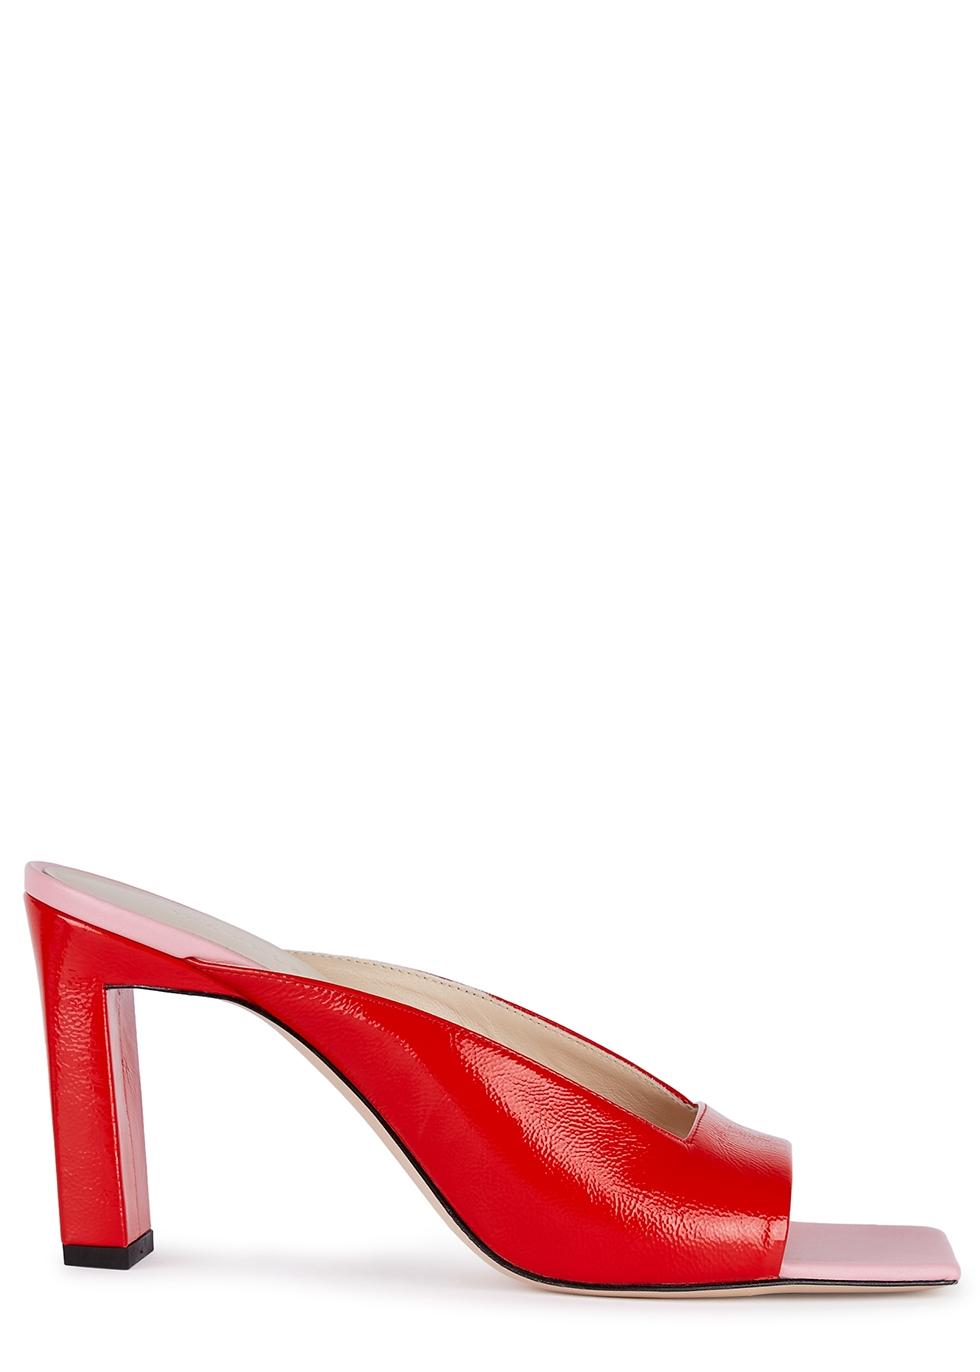 b071b5b53c Women's Designer Shoes - Ladies Shoes - Harvey Nichols